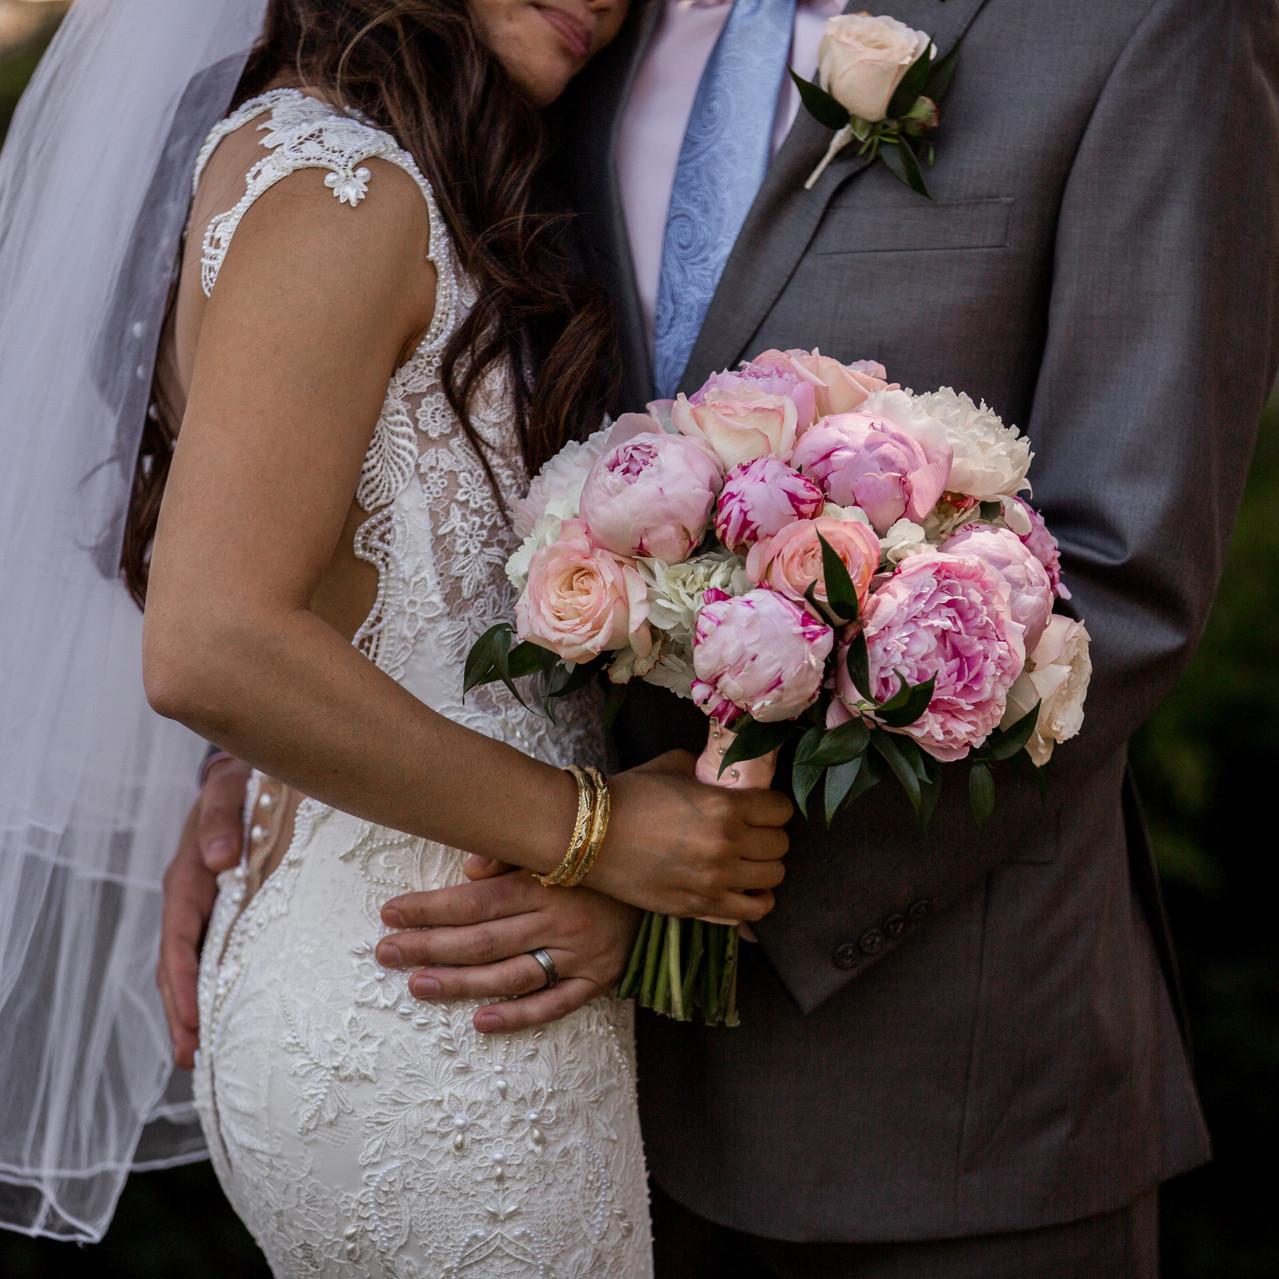 A-Floral-Affair-HYATT-LAKE-TAHOE-WEDDING-FLORIST (4)